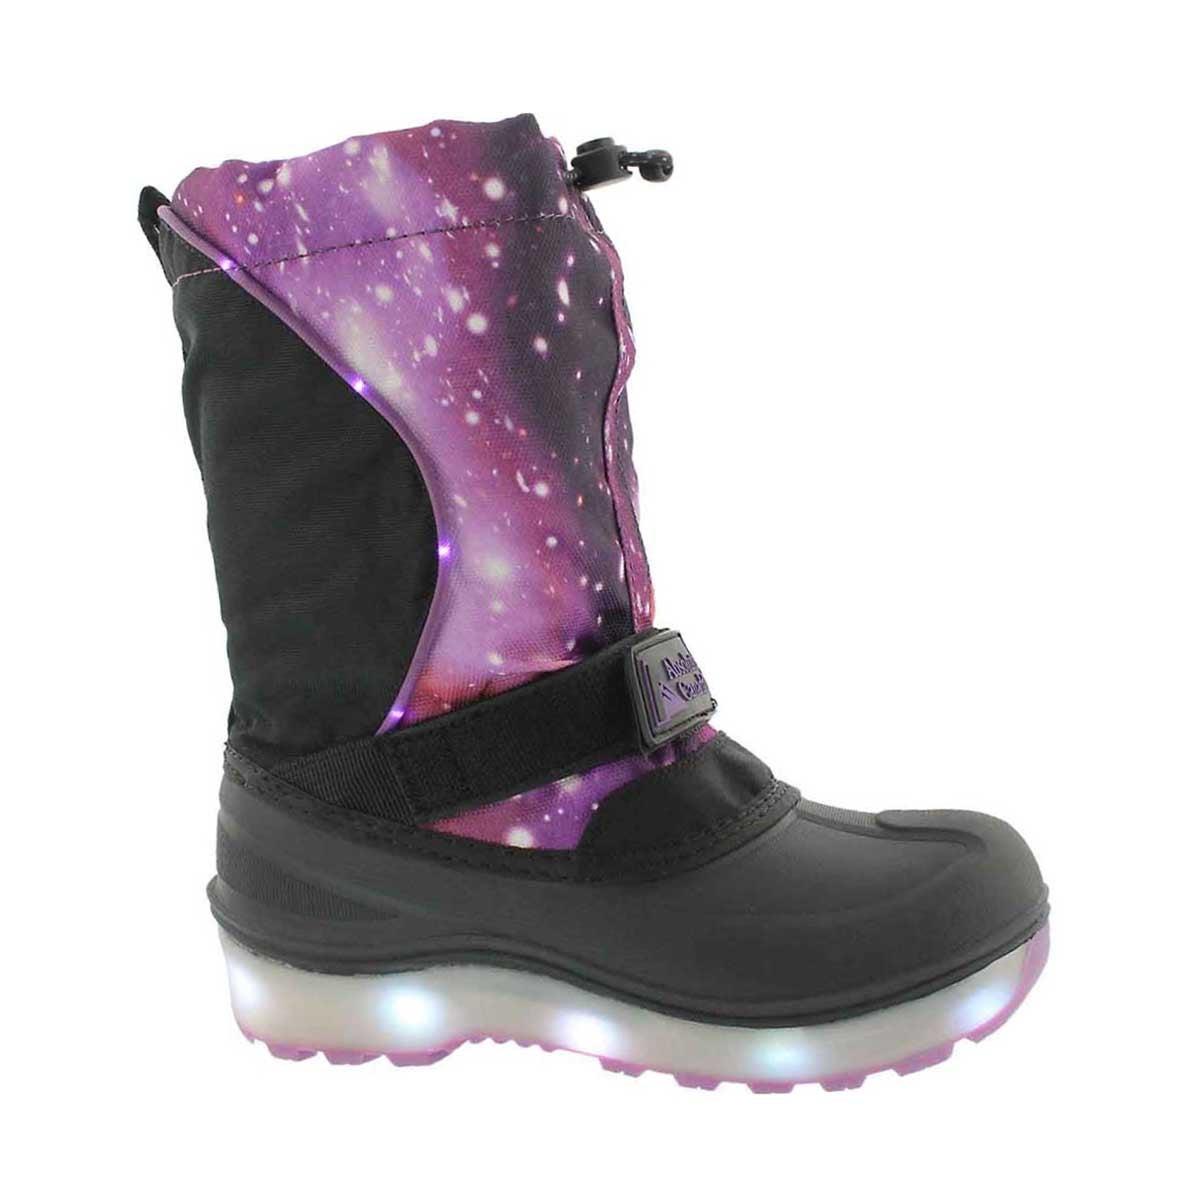 Girls' COSMOS purple wtprf light up winter boots